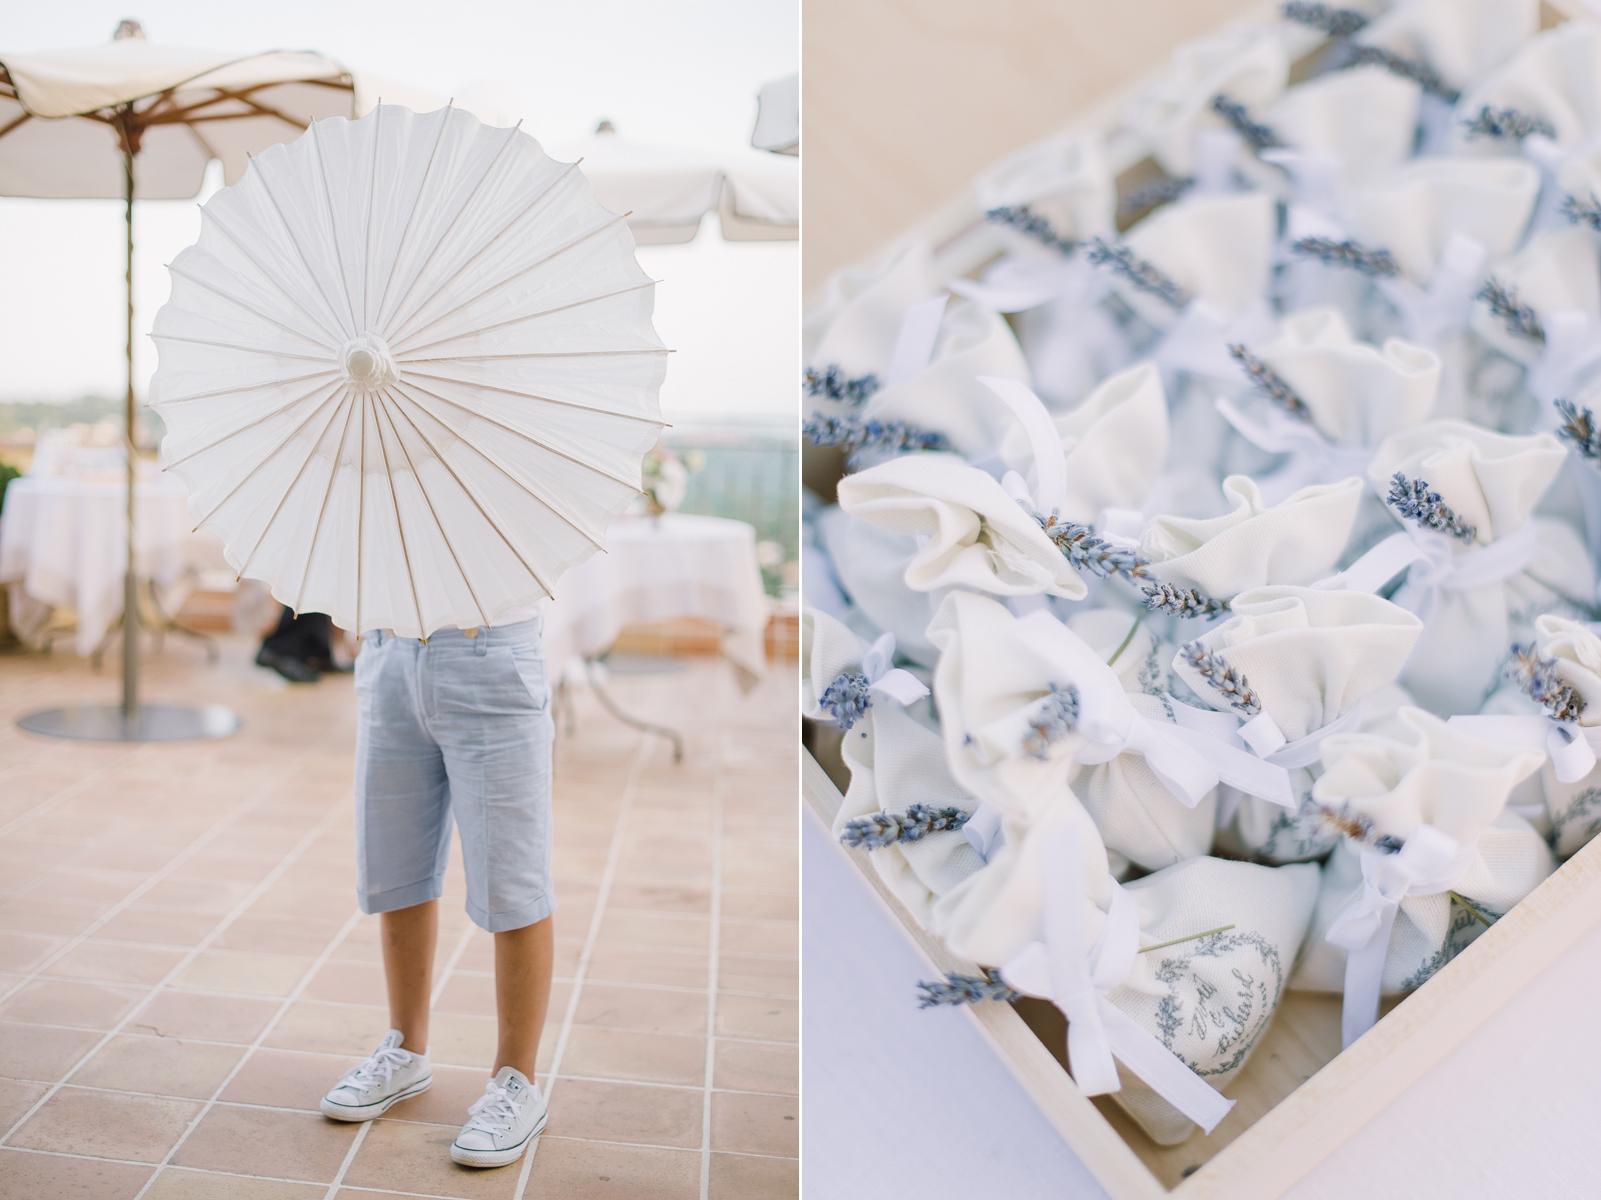 BohemeMoonPhotography-Grasse-provence-wedding-photographer_30.jpg